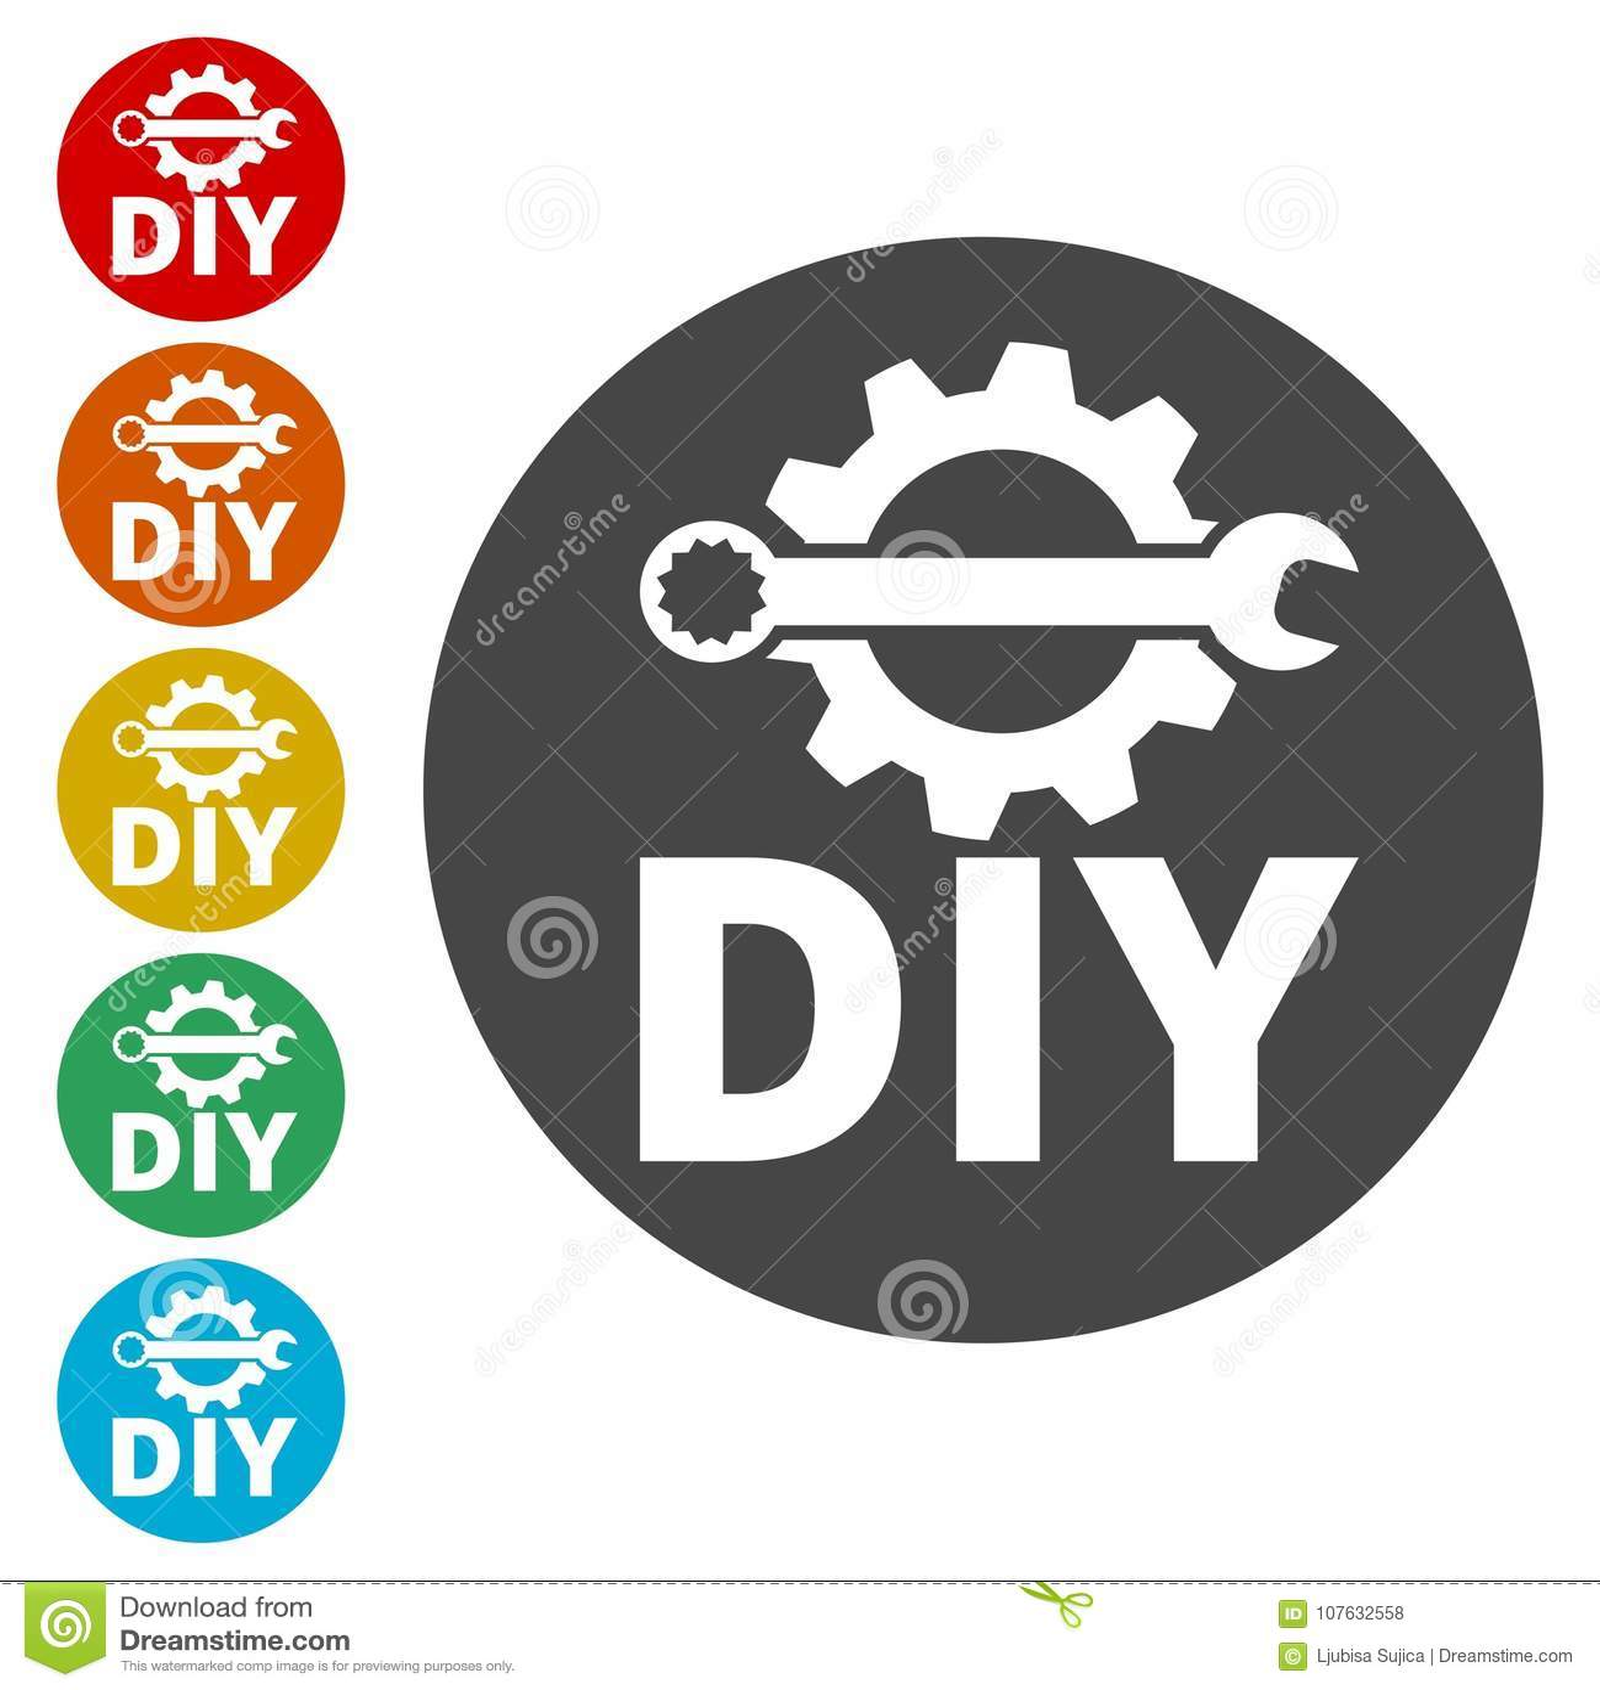 Do it yourself icon diy icon stock vector illustration of download do it yourself icon diy icon stock vector illustration of hardware design solutioingenieria Choice Image